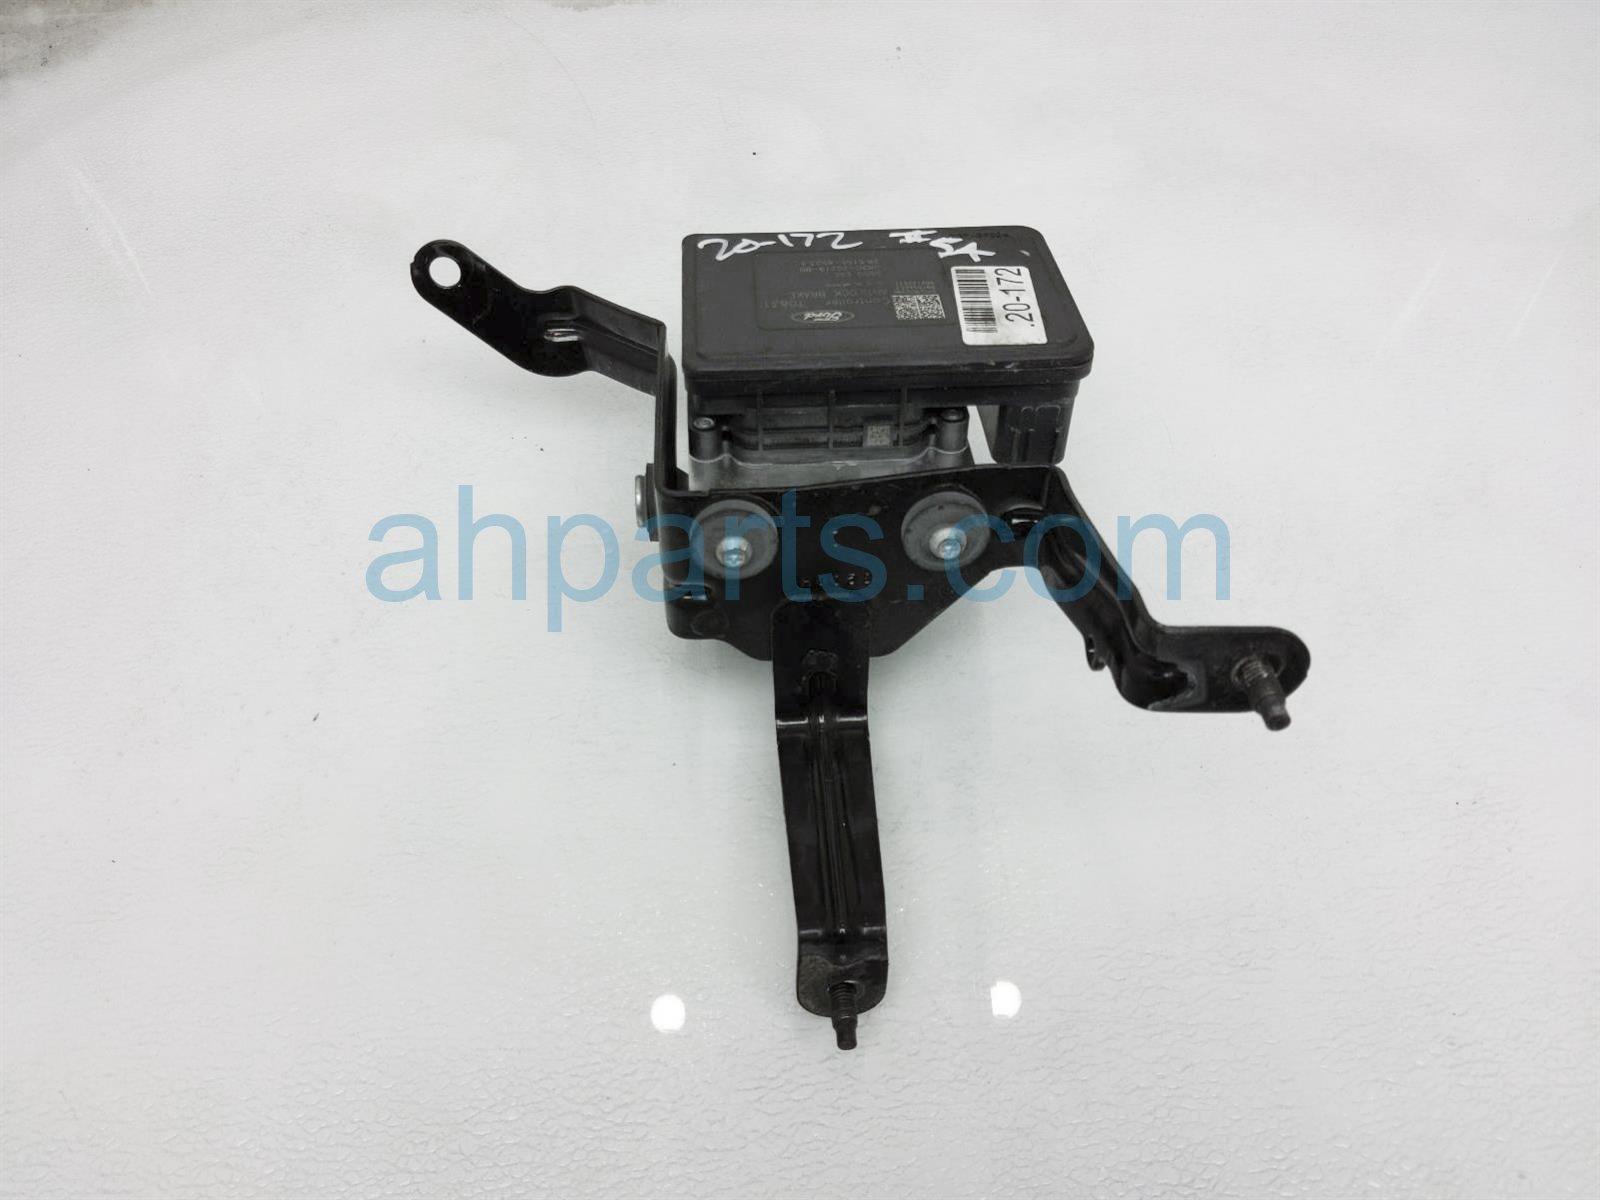 2017 Ford Mustang Abs/vsa (anti Lock Brake) Vsa/abs Pump Modulator GR3Z 2C215 D Replacement